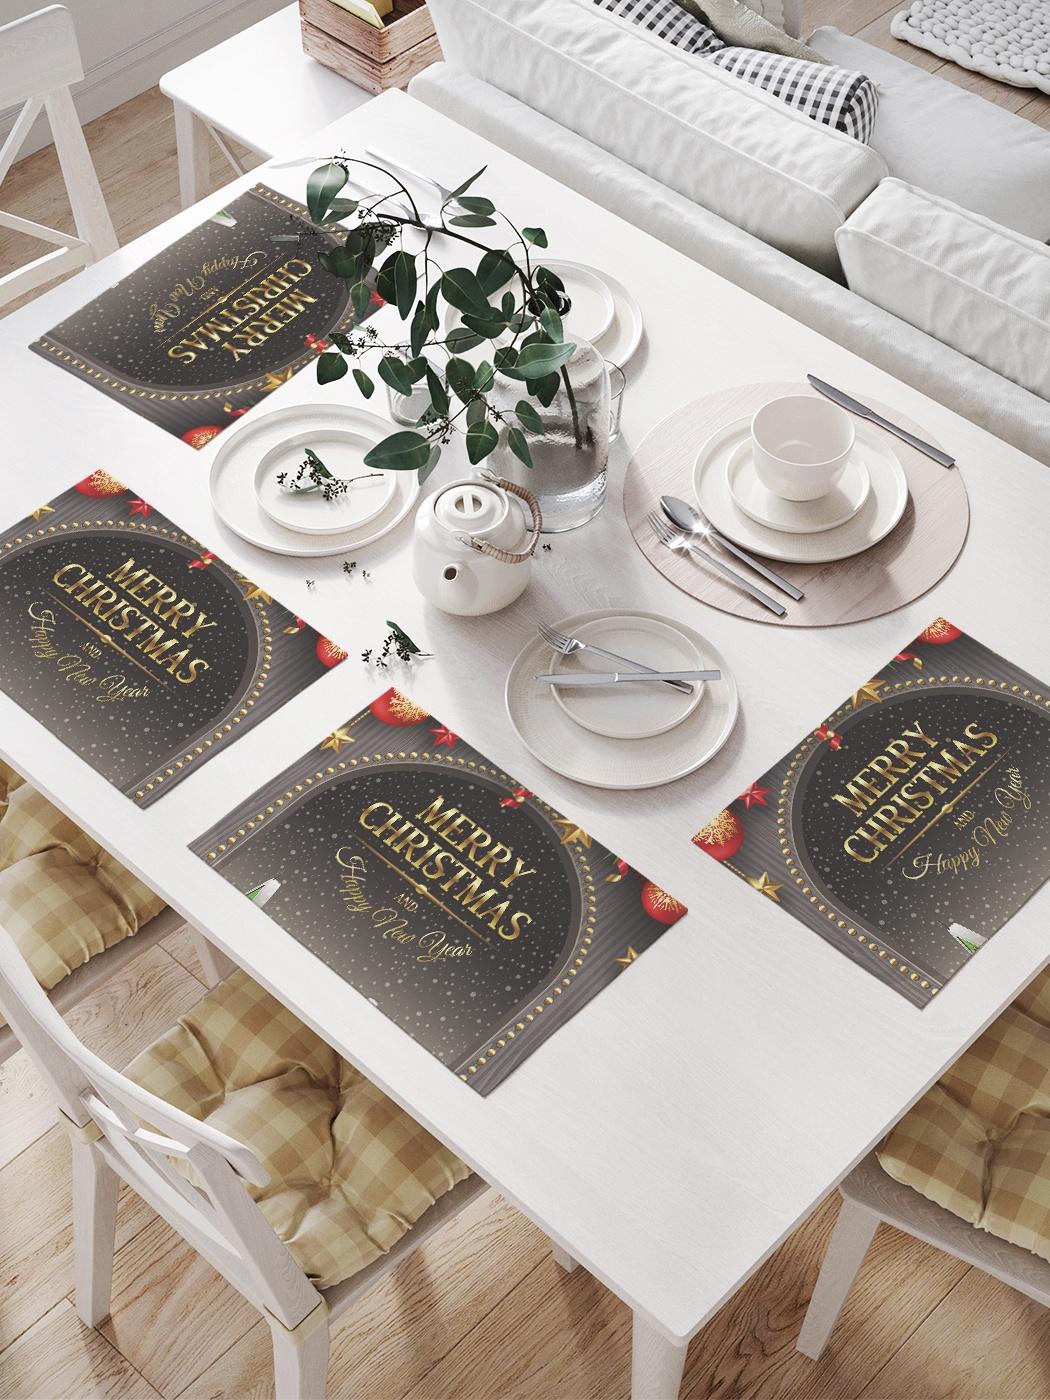 Комплект салфеток для сервировки стола «Ночь перед рождеством» (32х46 см, 4 шт.)